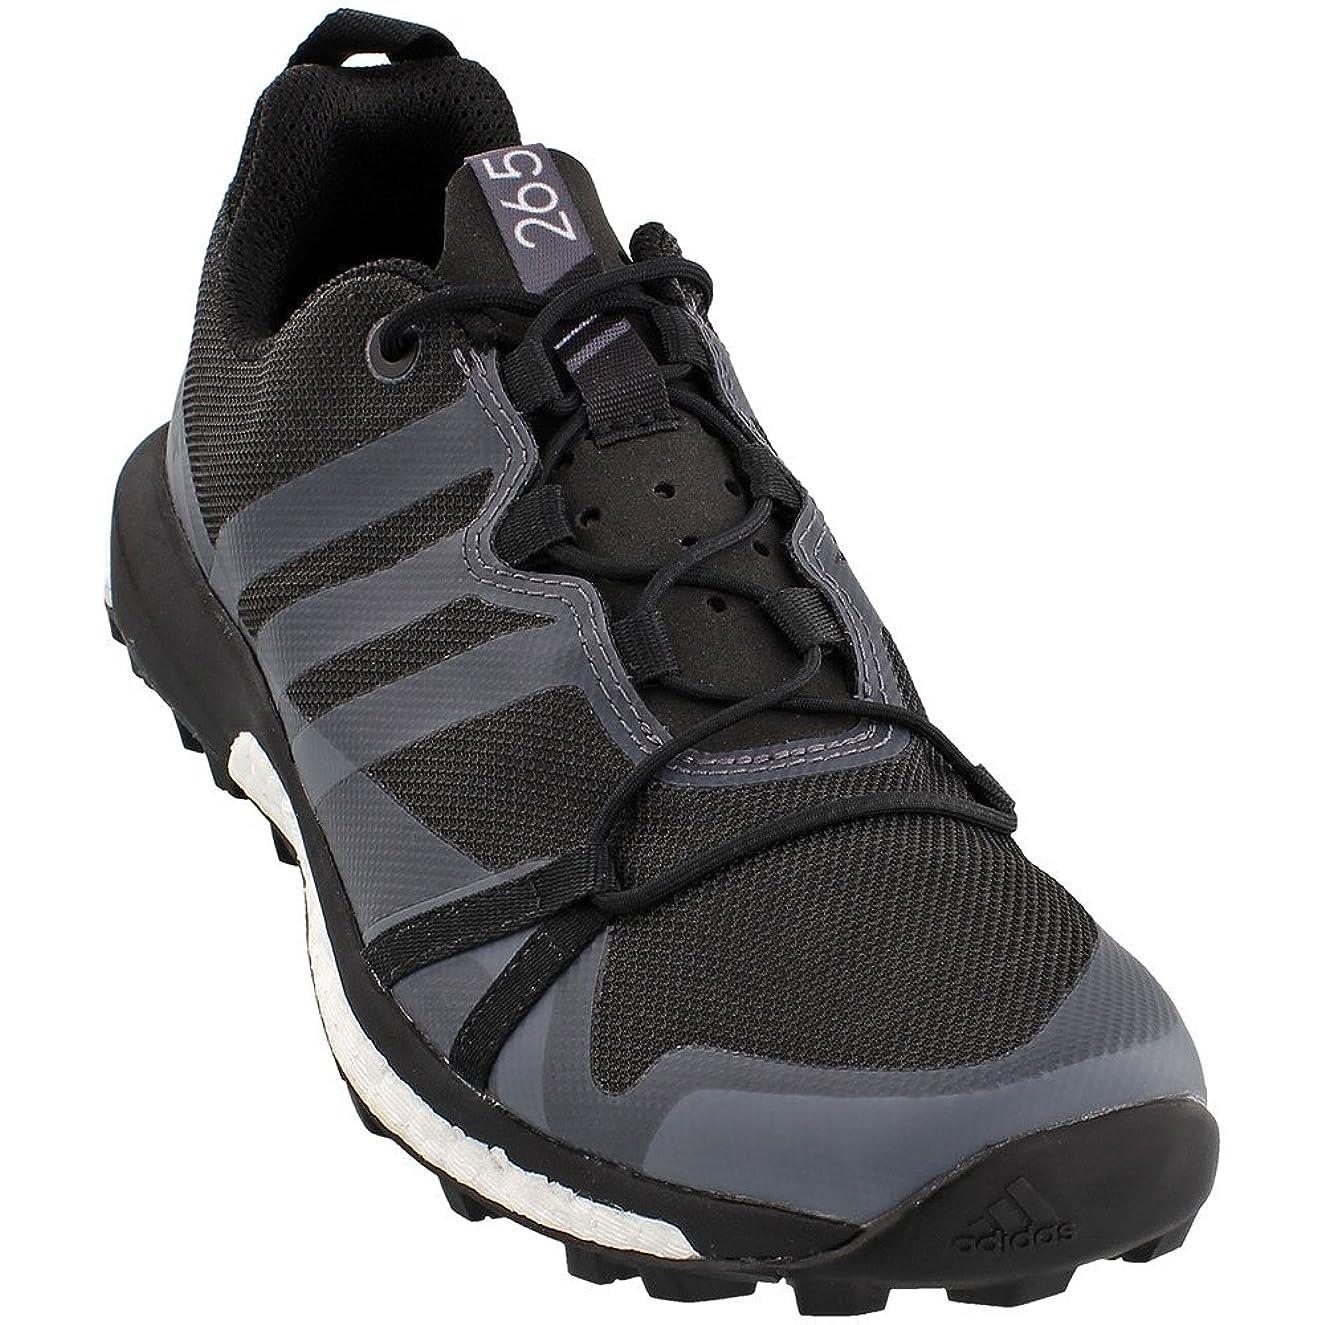 adidas Terrex Agravic Shoe - Women's Trail Running 6.5 Black/Trace Grey